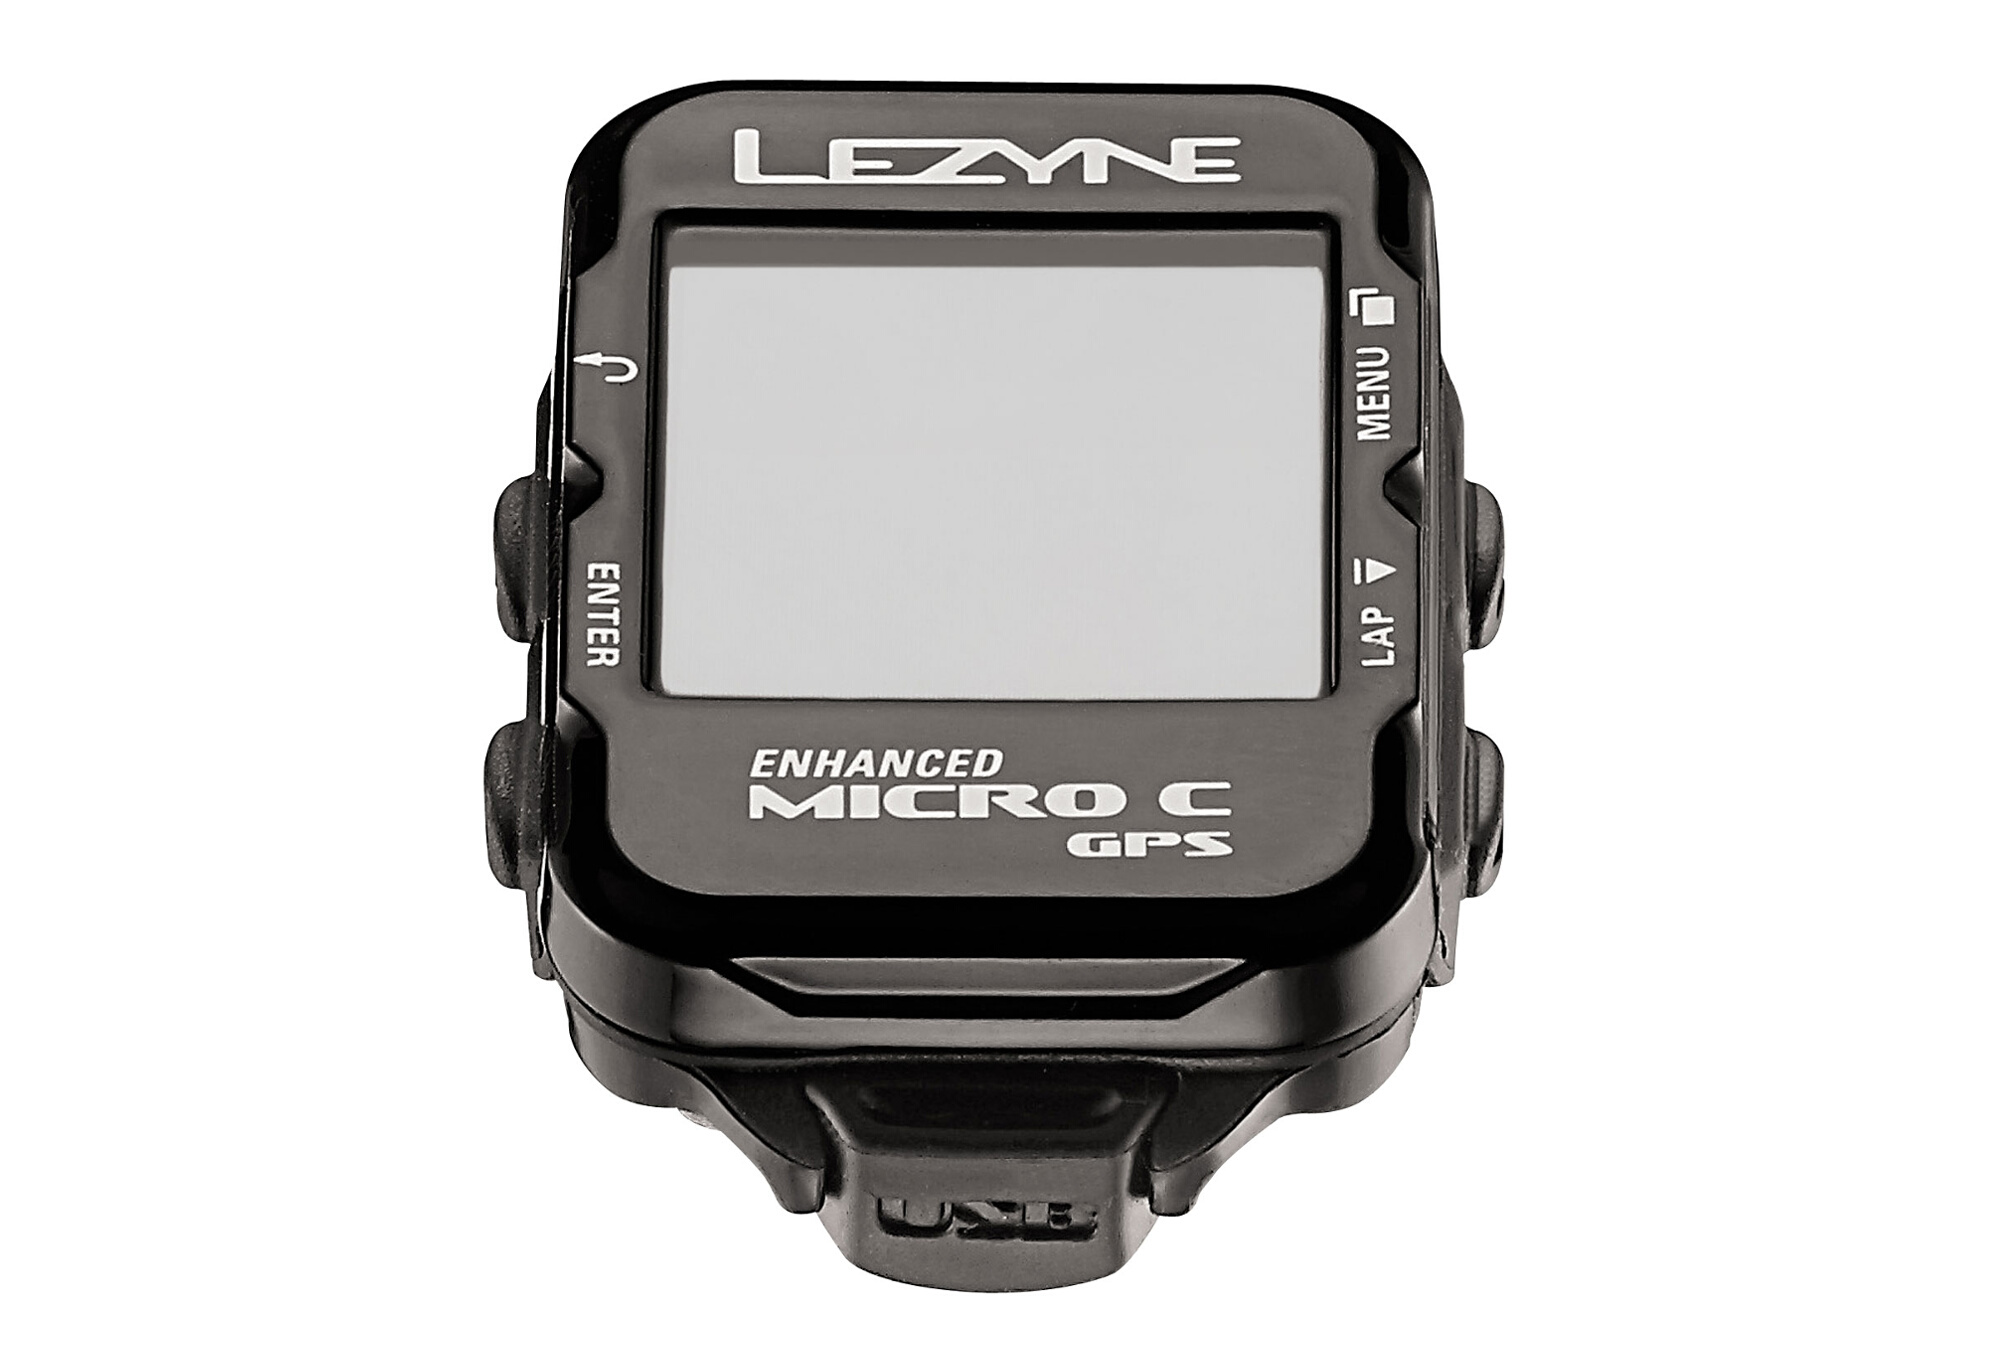 Lezyne Micro GPS écran couleur noir